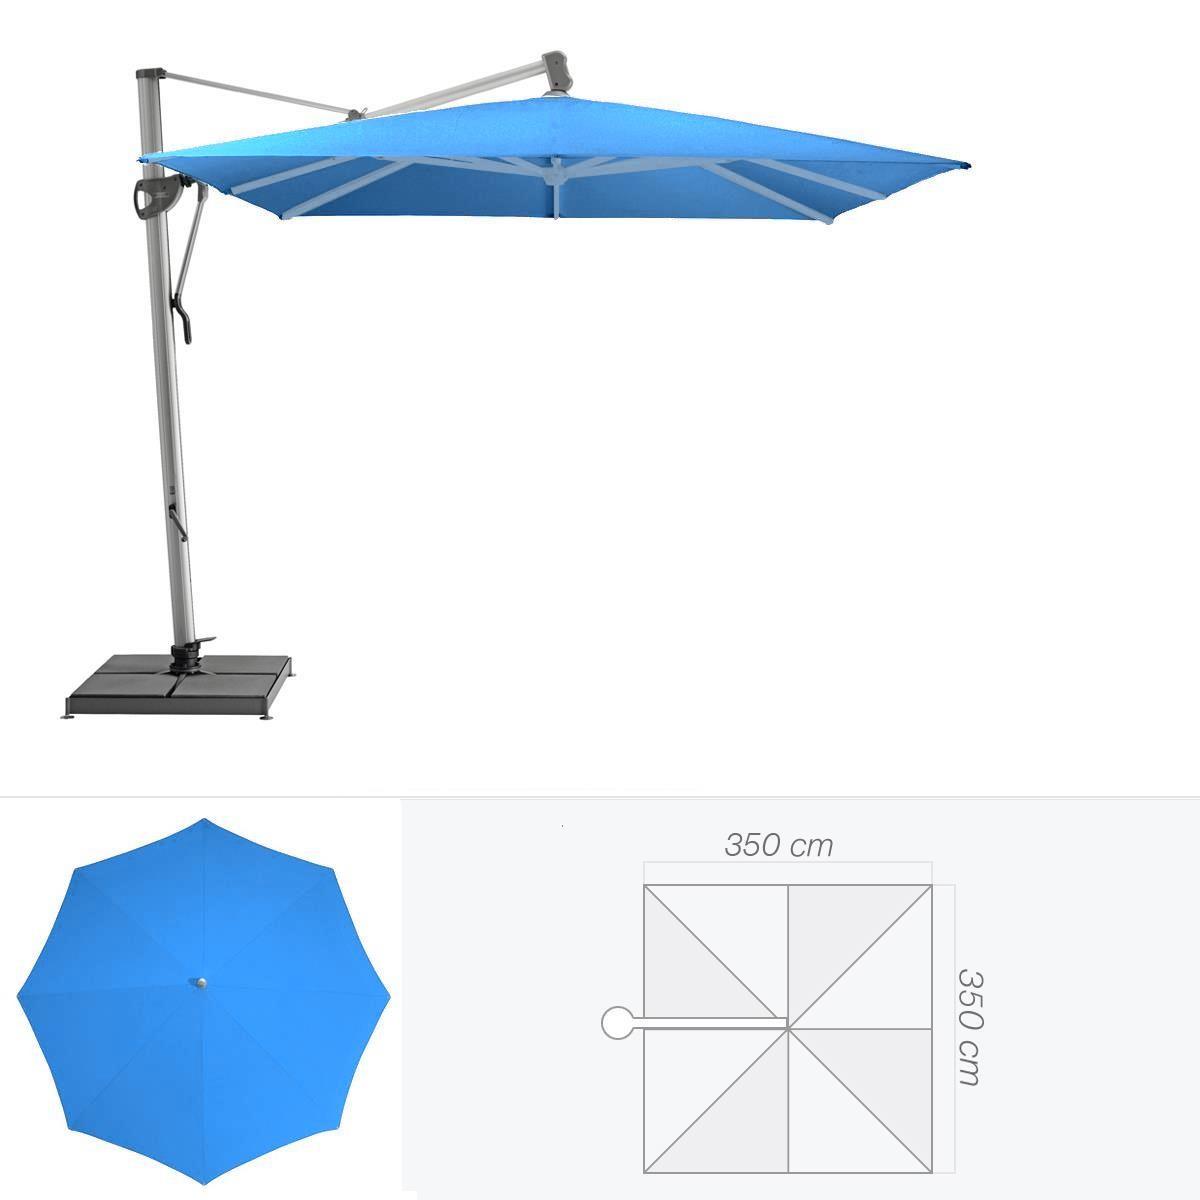 glatz parasol d centr sombrano de glatz carr 350x350. Black Bedroom Furniture Sets. Home Design Ideas